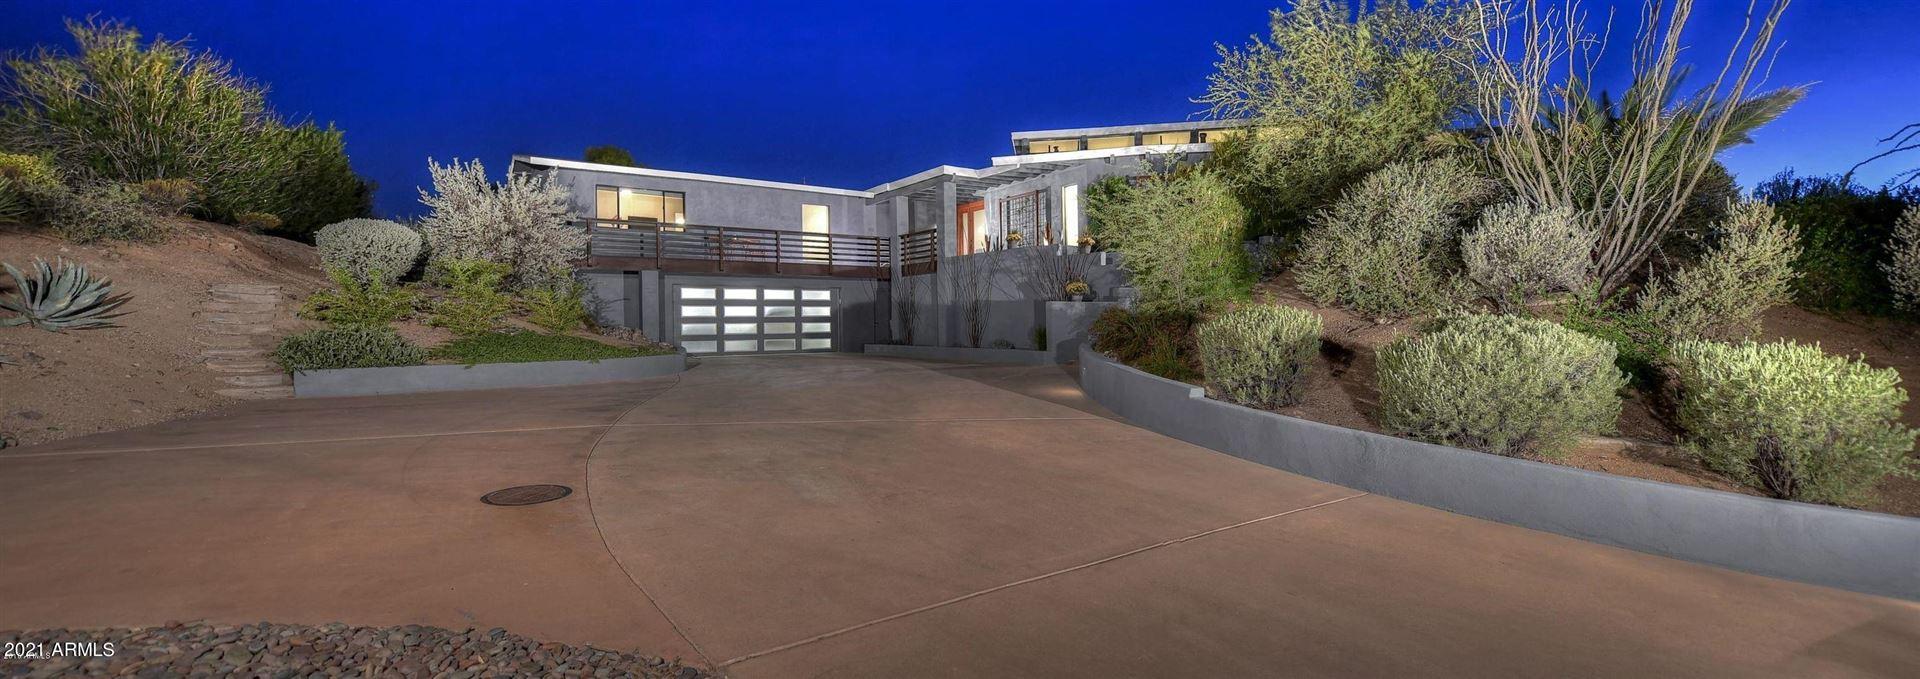 Photo of 8545 E Double Eagle Drive, Carefree, AZ 85377 (MLS # 6197008)